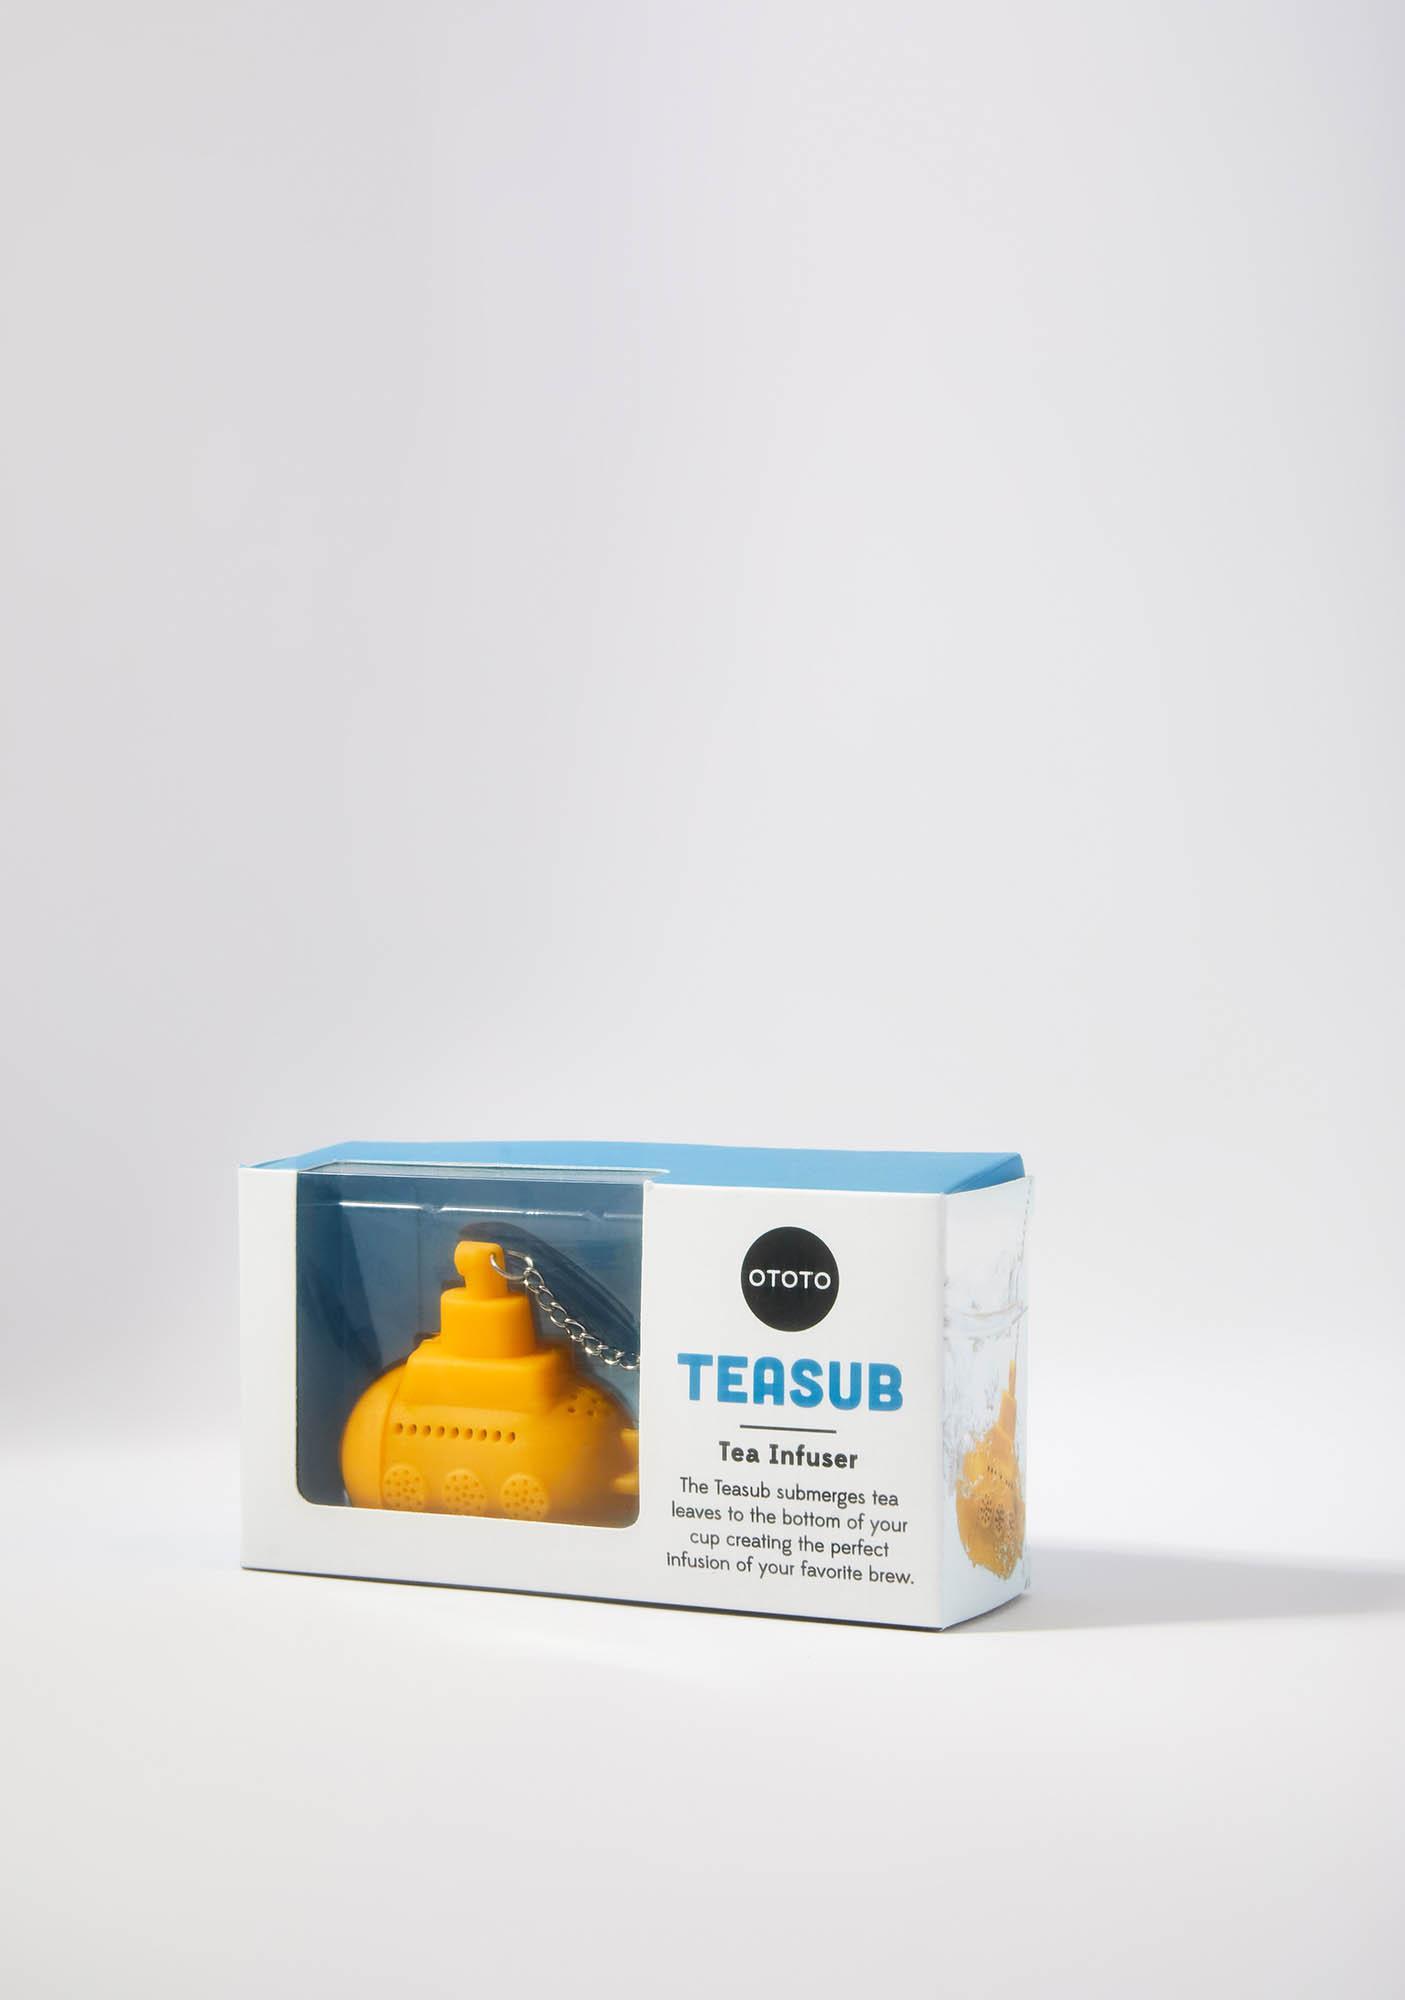 OTOTO Submarine Tea Infuser